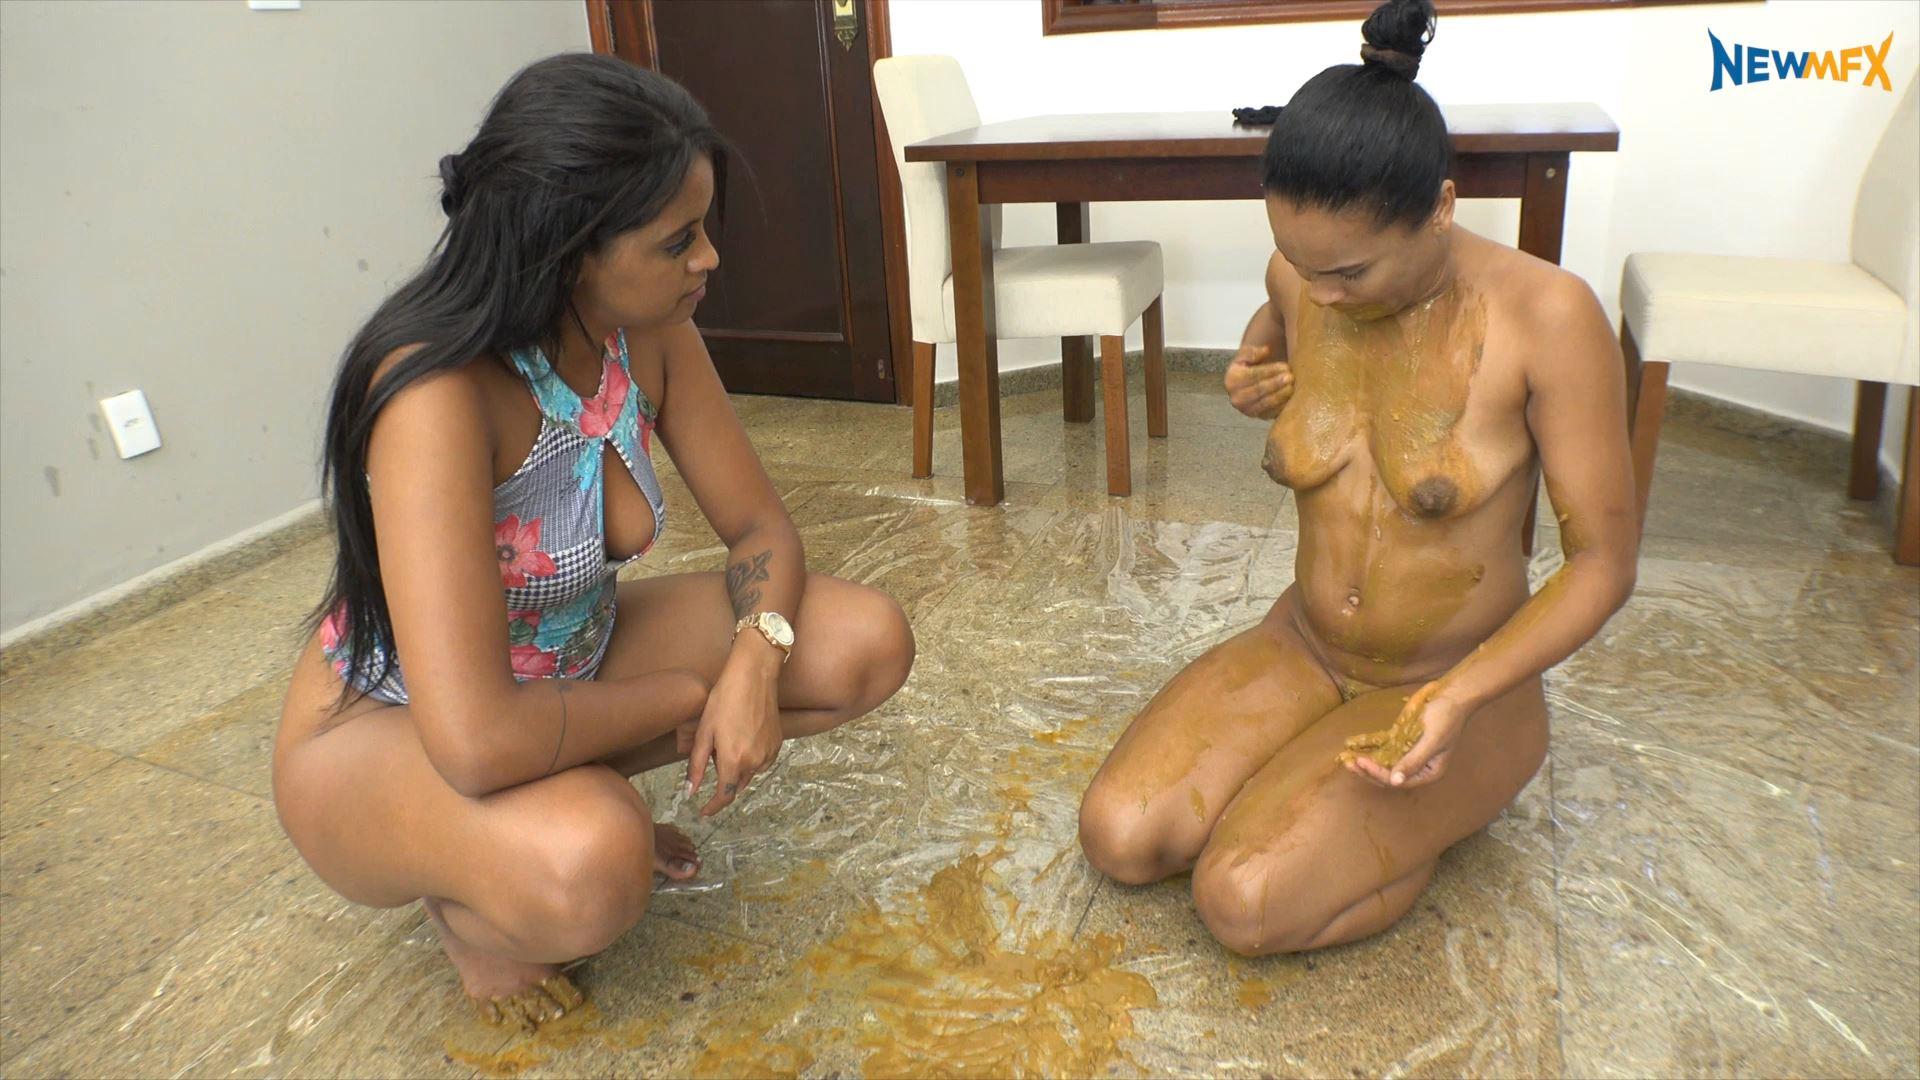 [NEW SCAT IN BRAZIL / NEWMFX] SHARING MY PRECIOUS. Featuring: Lisa Black, Isa Blue [FULL HD][1080p][MP4]